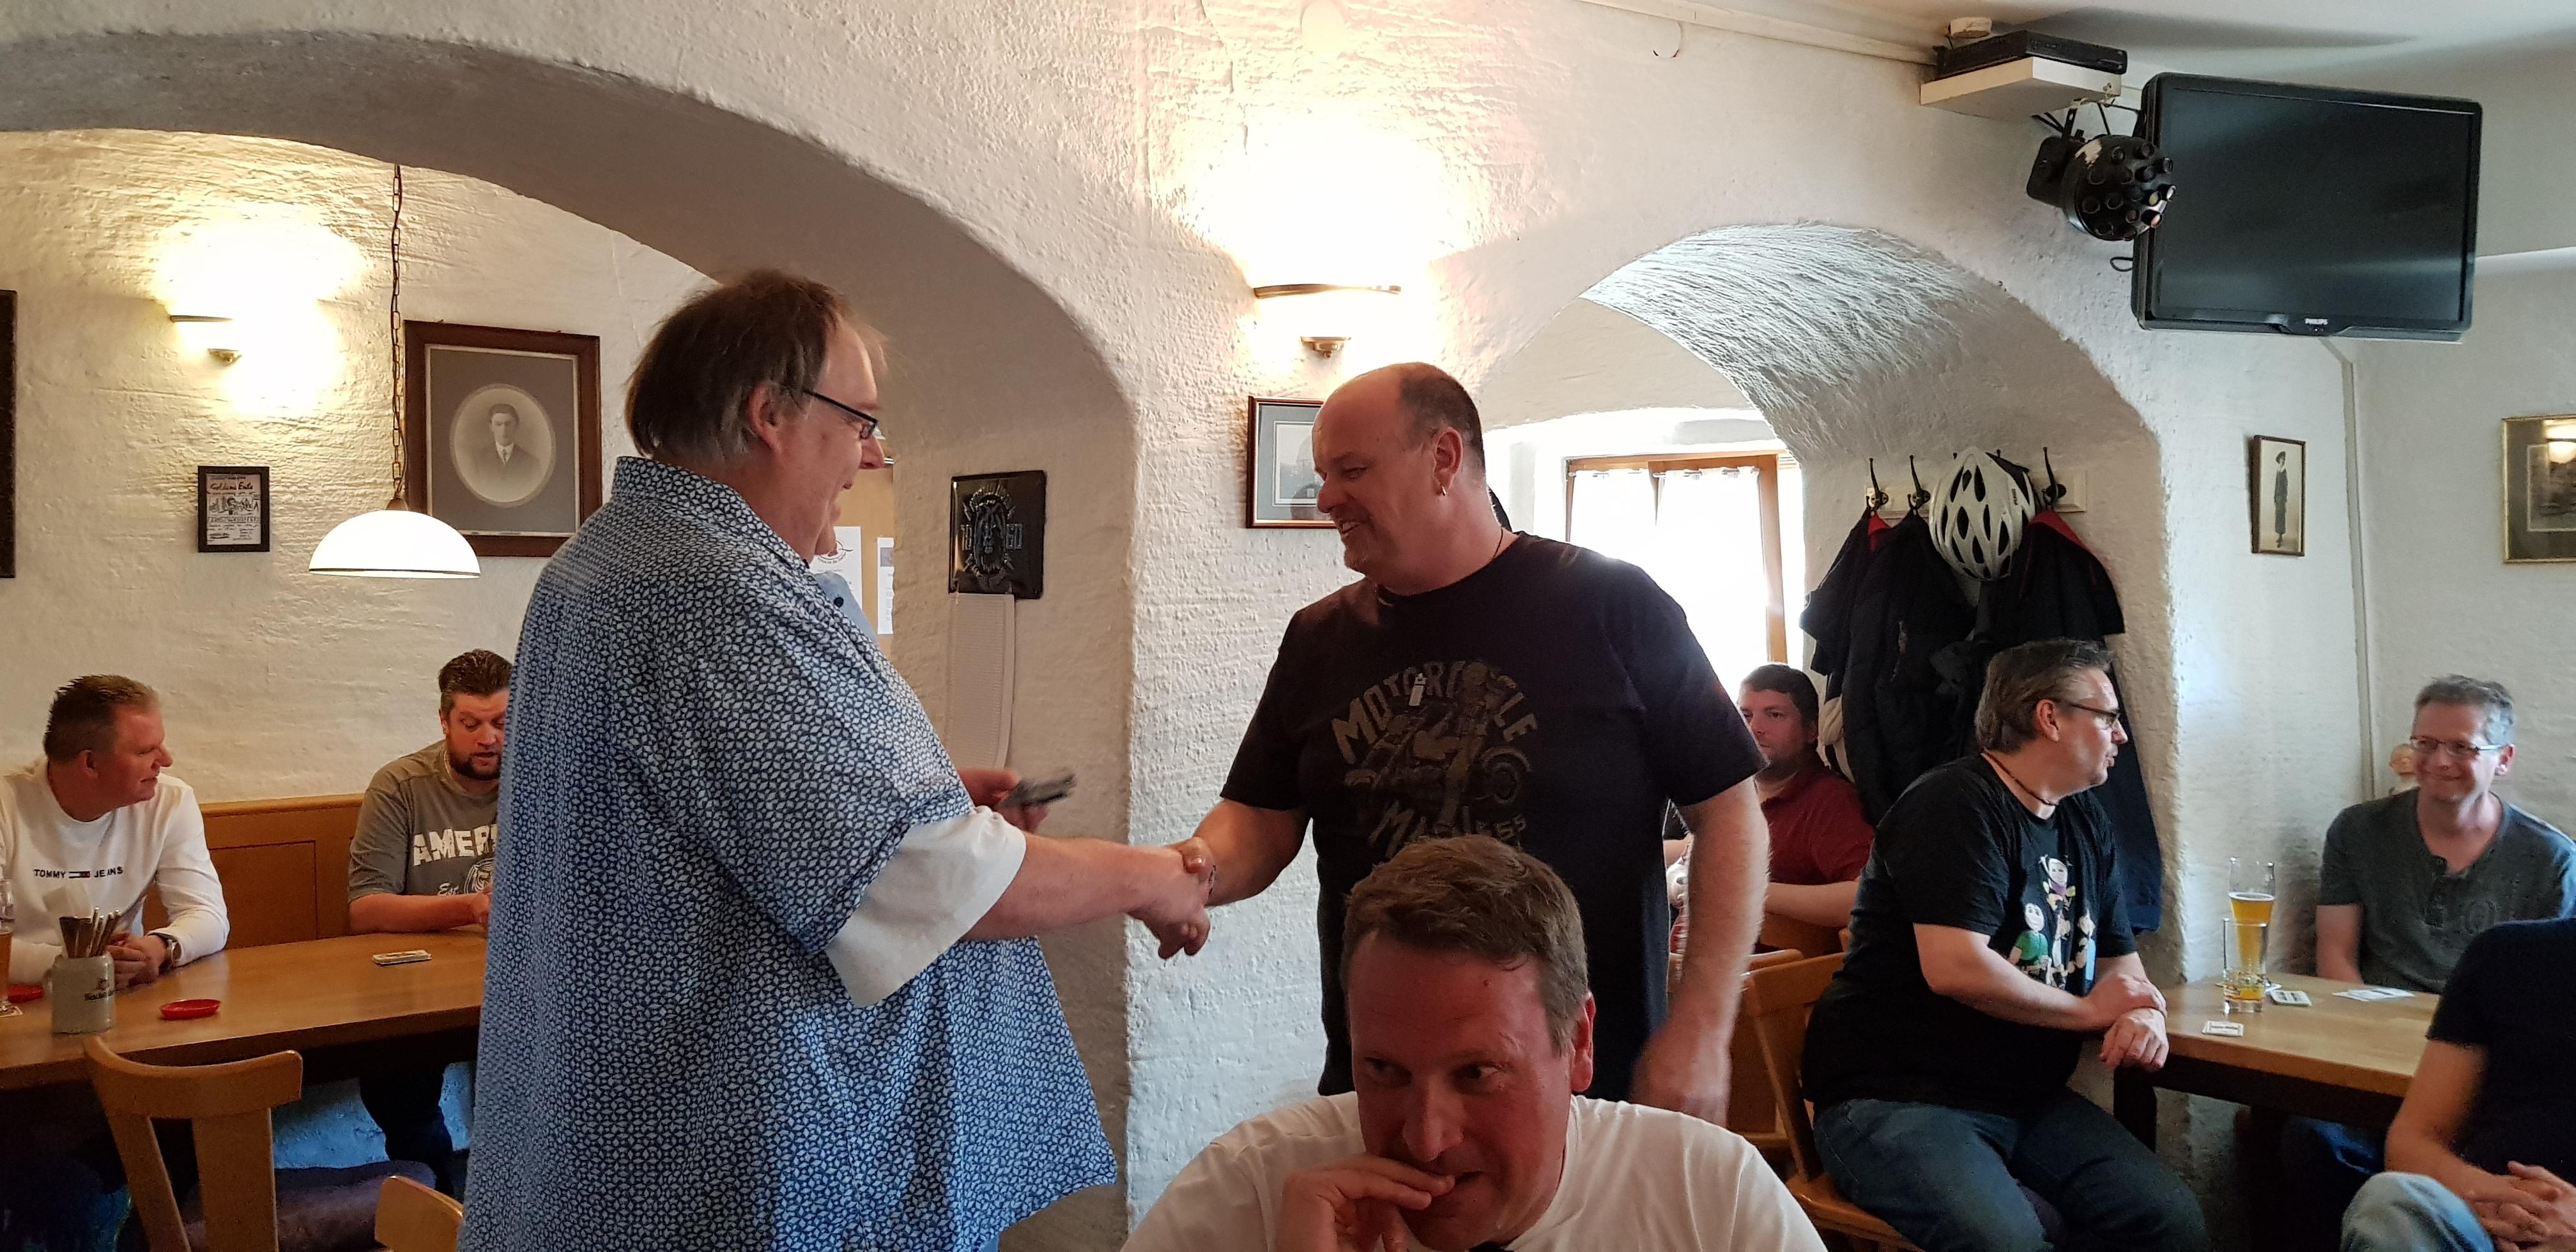 OMA ANTN Karfreitag Schafkopfturnier 2019 023